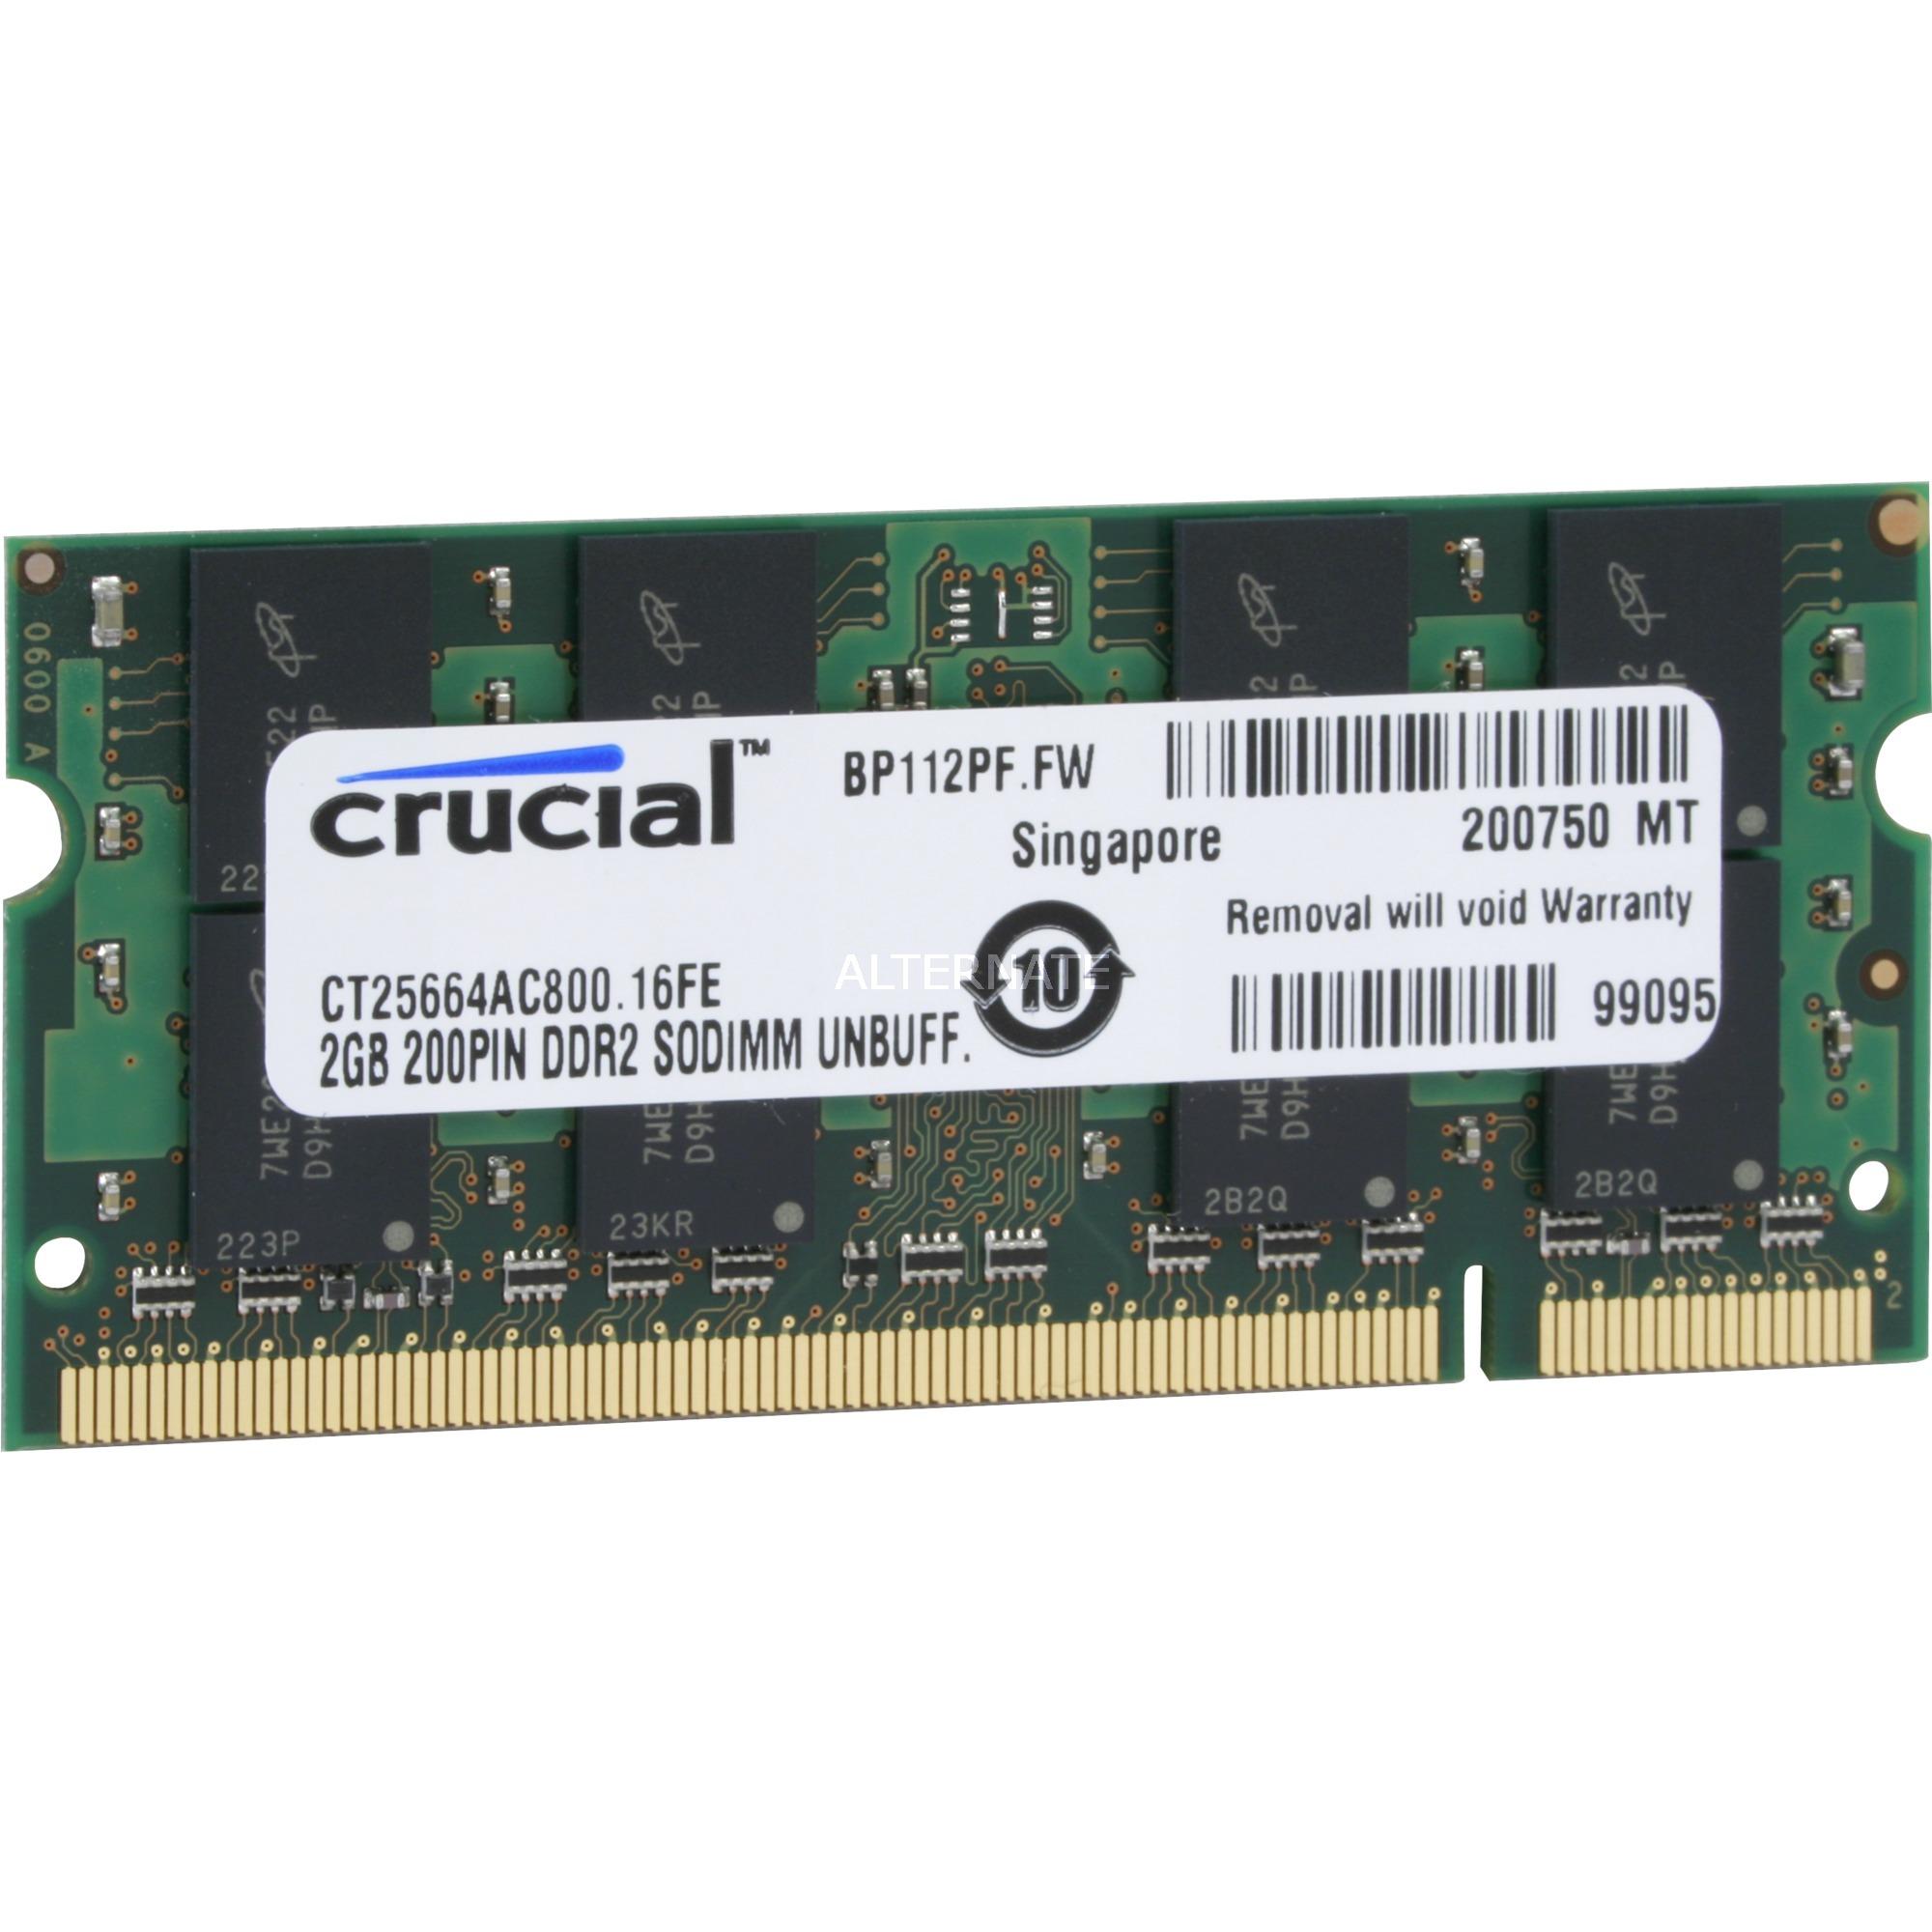 2GB DDR2 SODIMM módulo de memoria 800 MHz, Memoria RAM